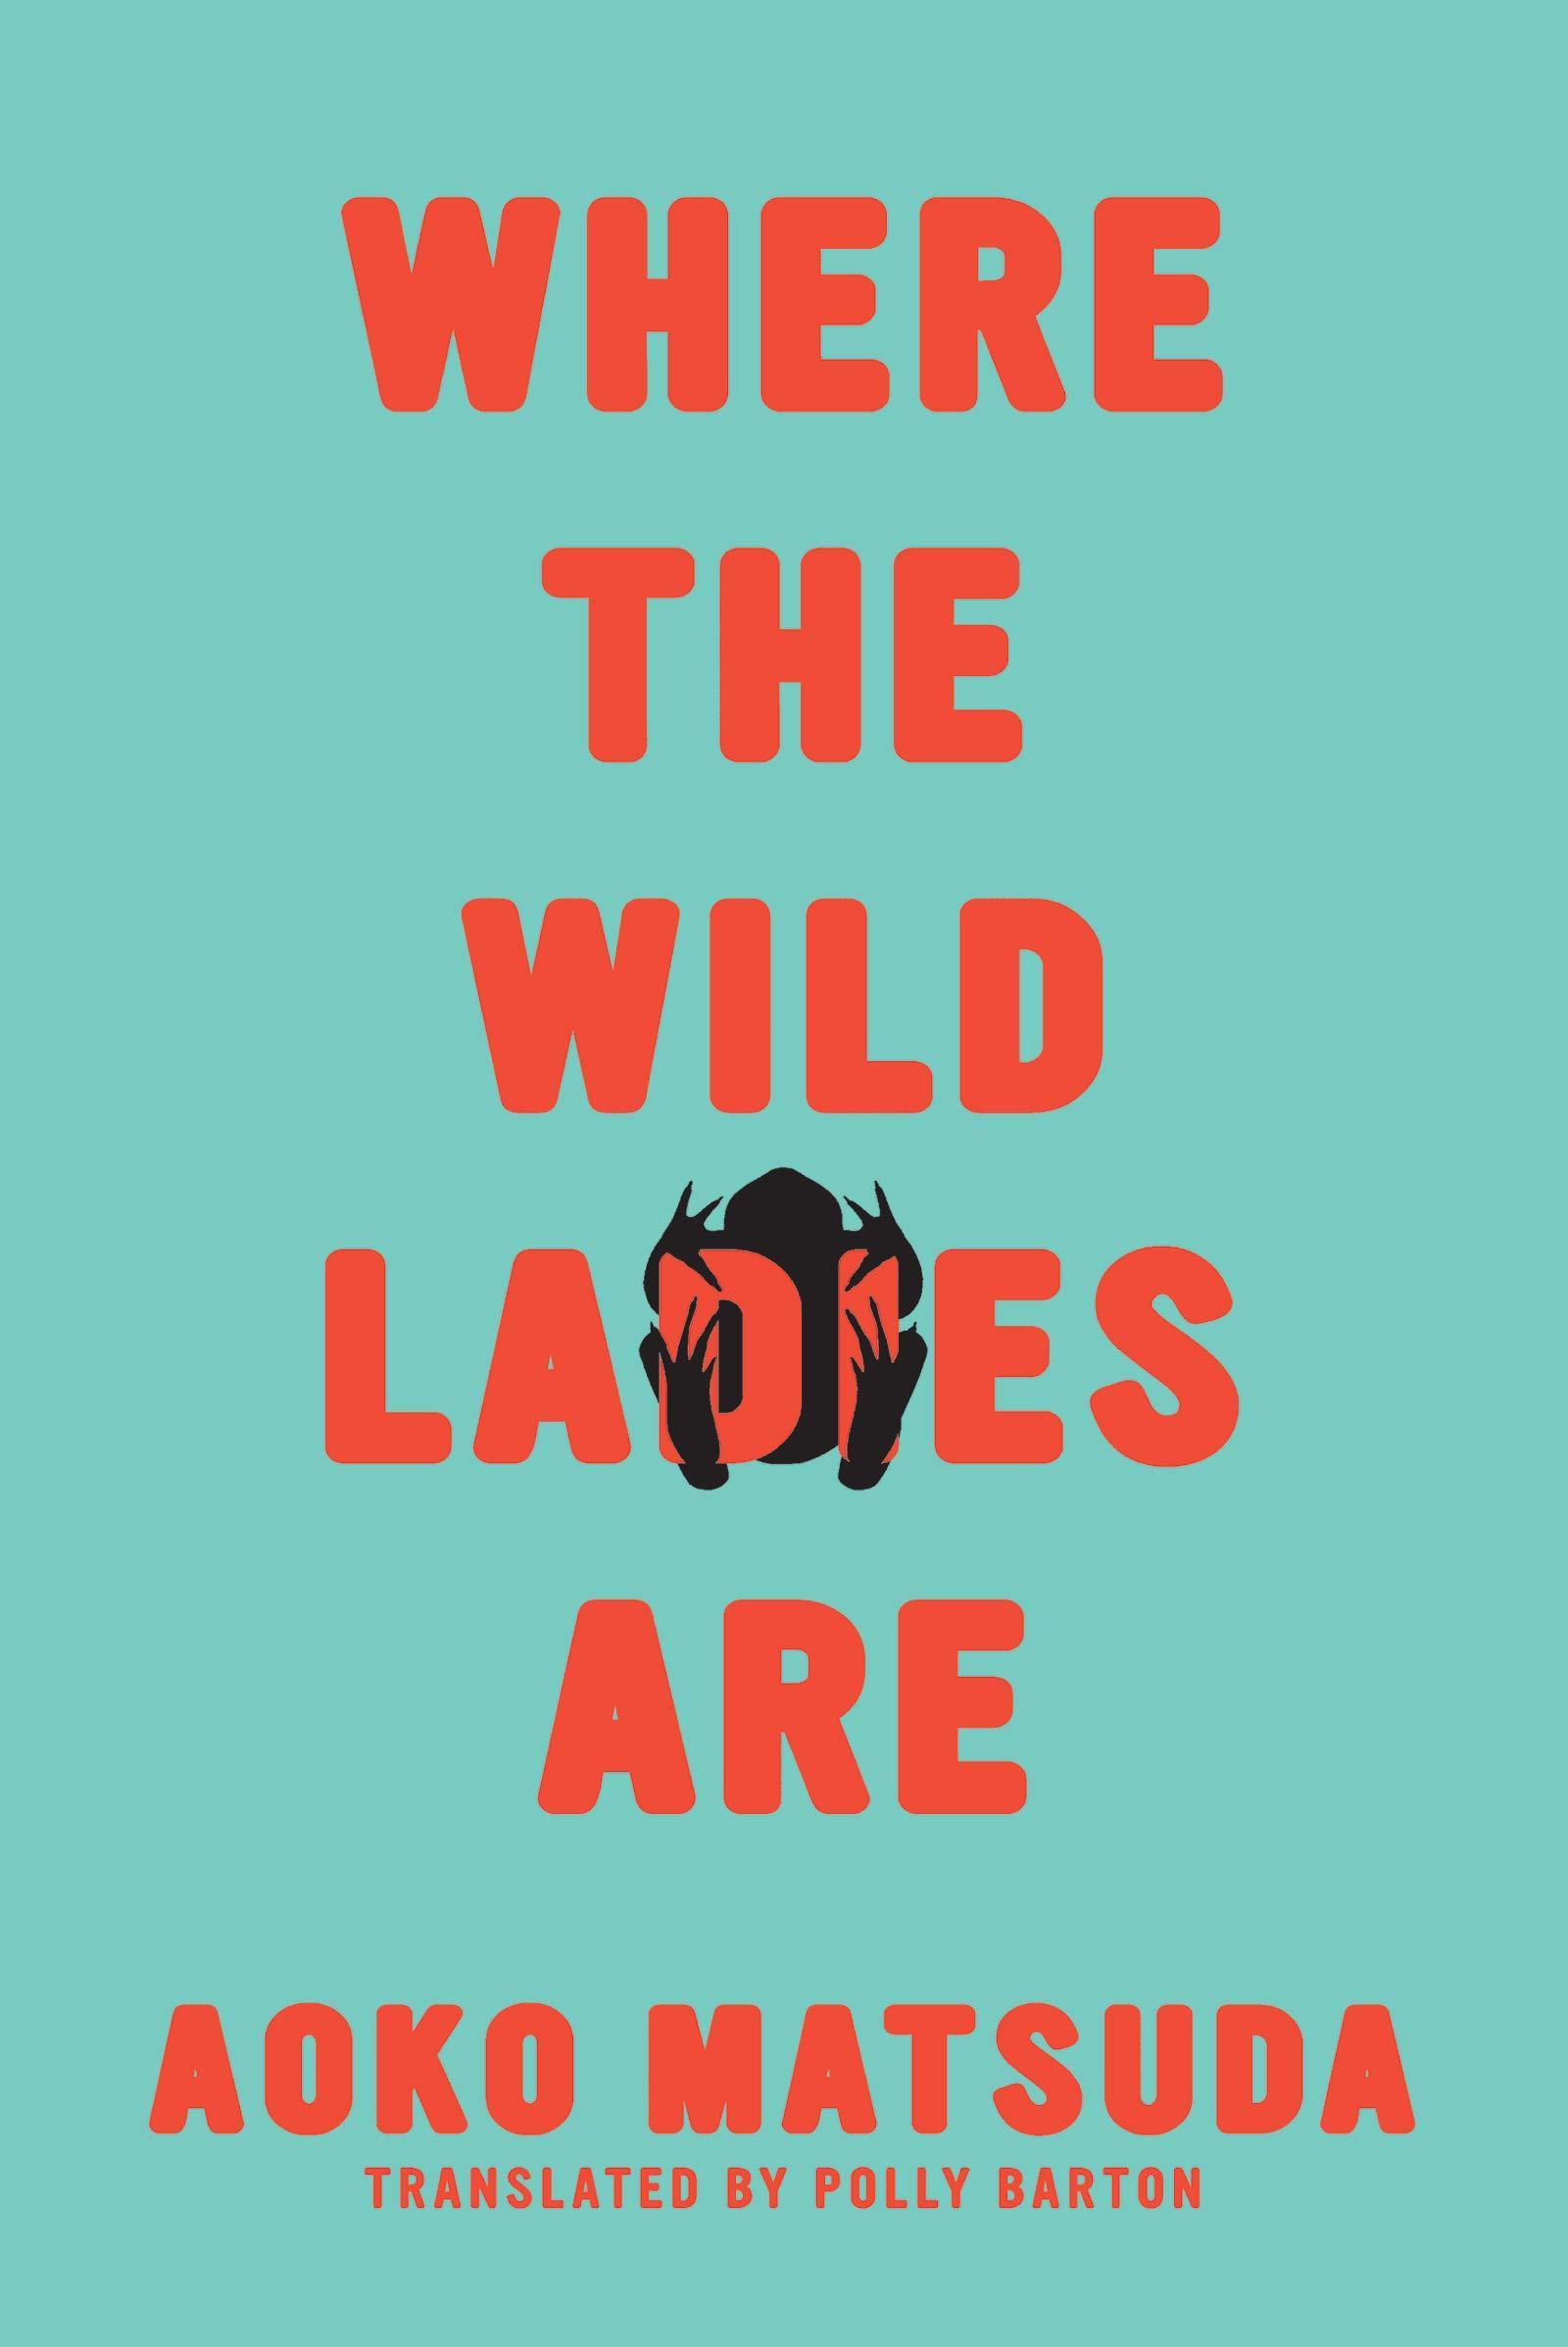 Where the Wild Ladies Are: Matsuda, Aoko, Barton, Polly: 9781593766900:  Amazon.com: Books